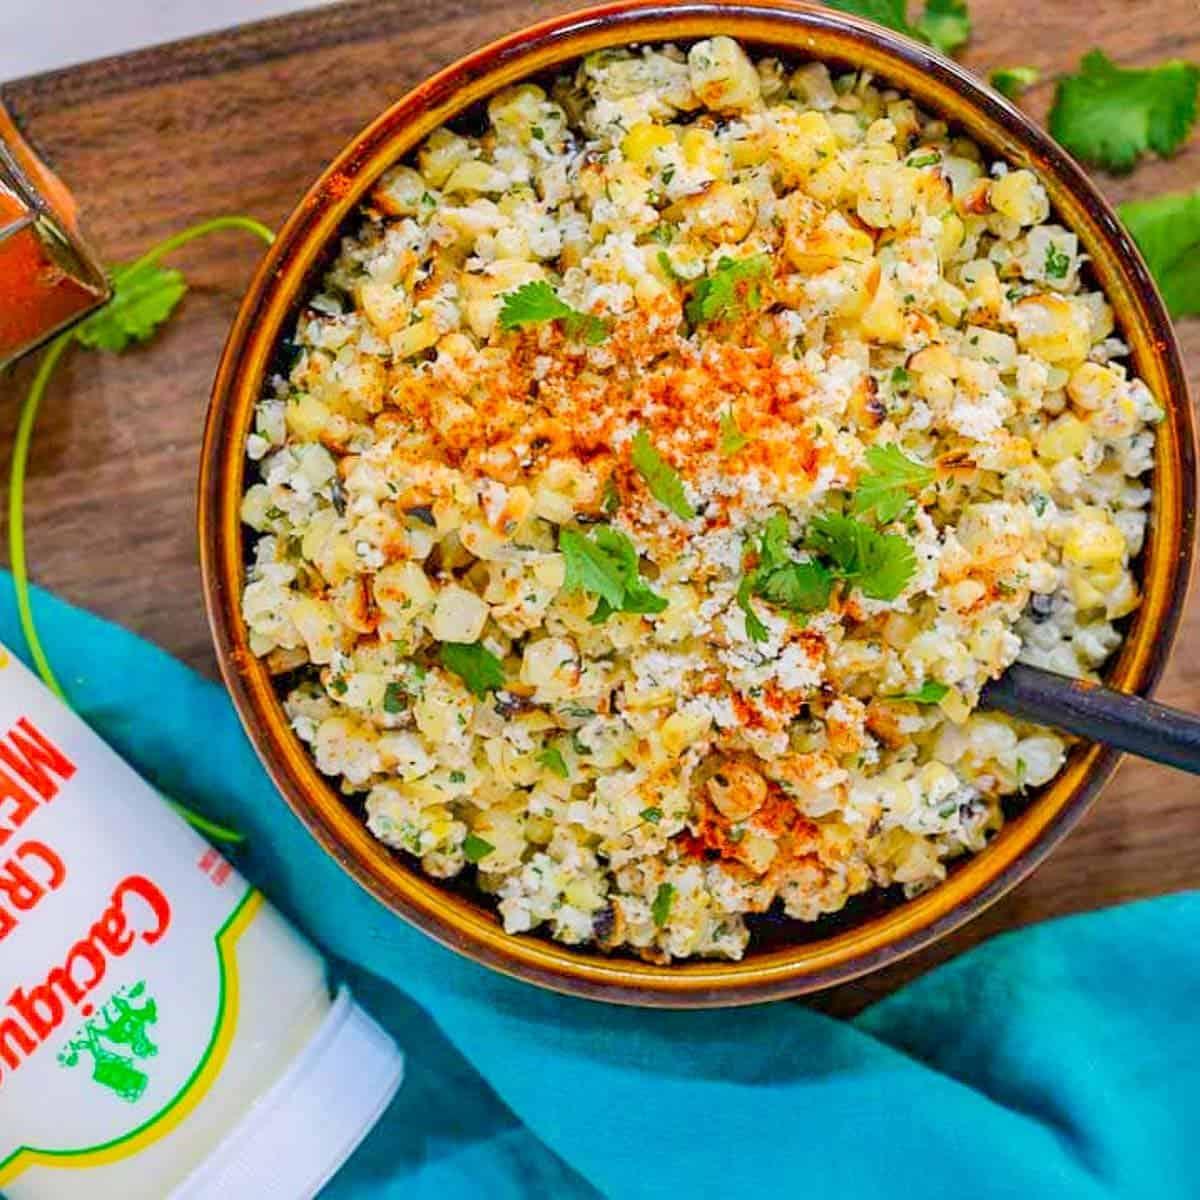 mexican corn salad recipe in a brown bowl with cilantro and crema